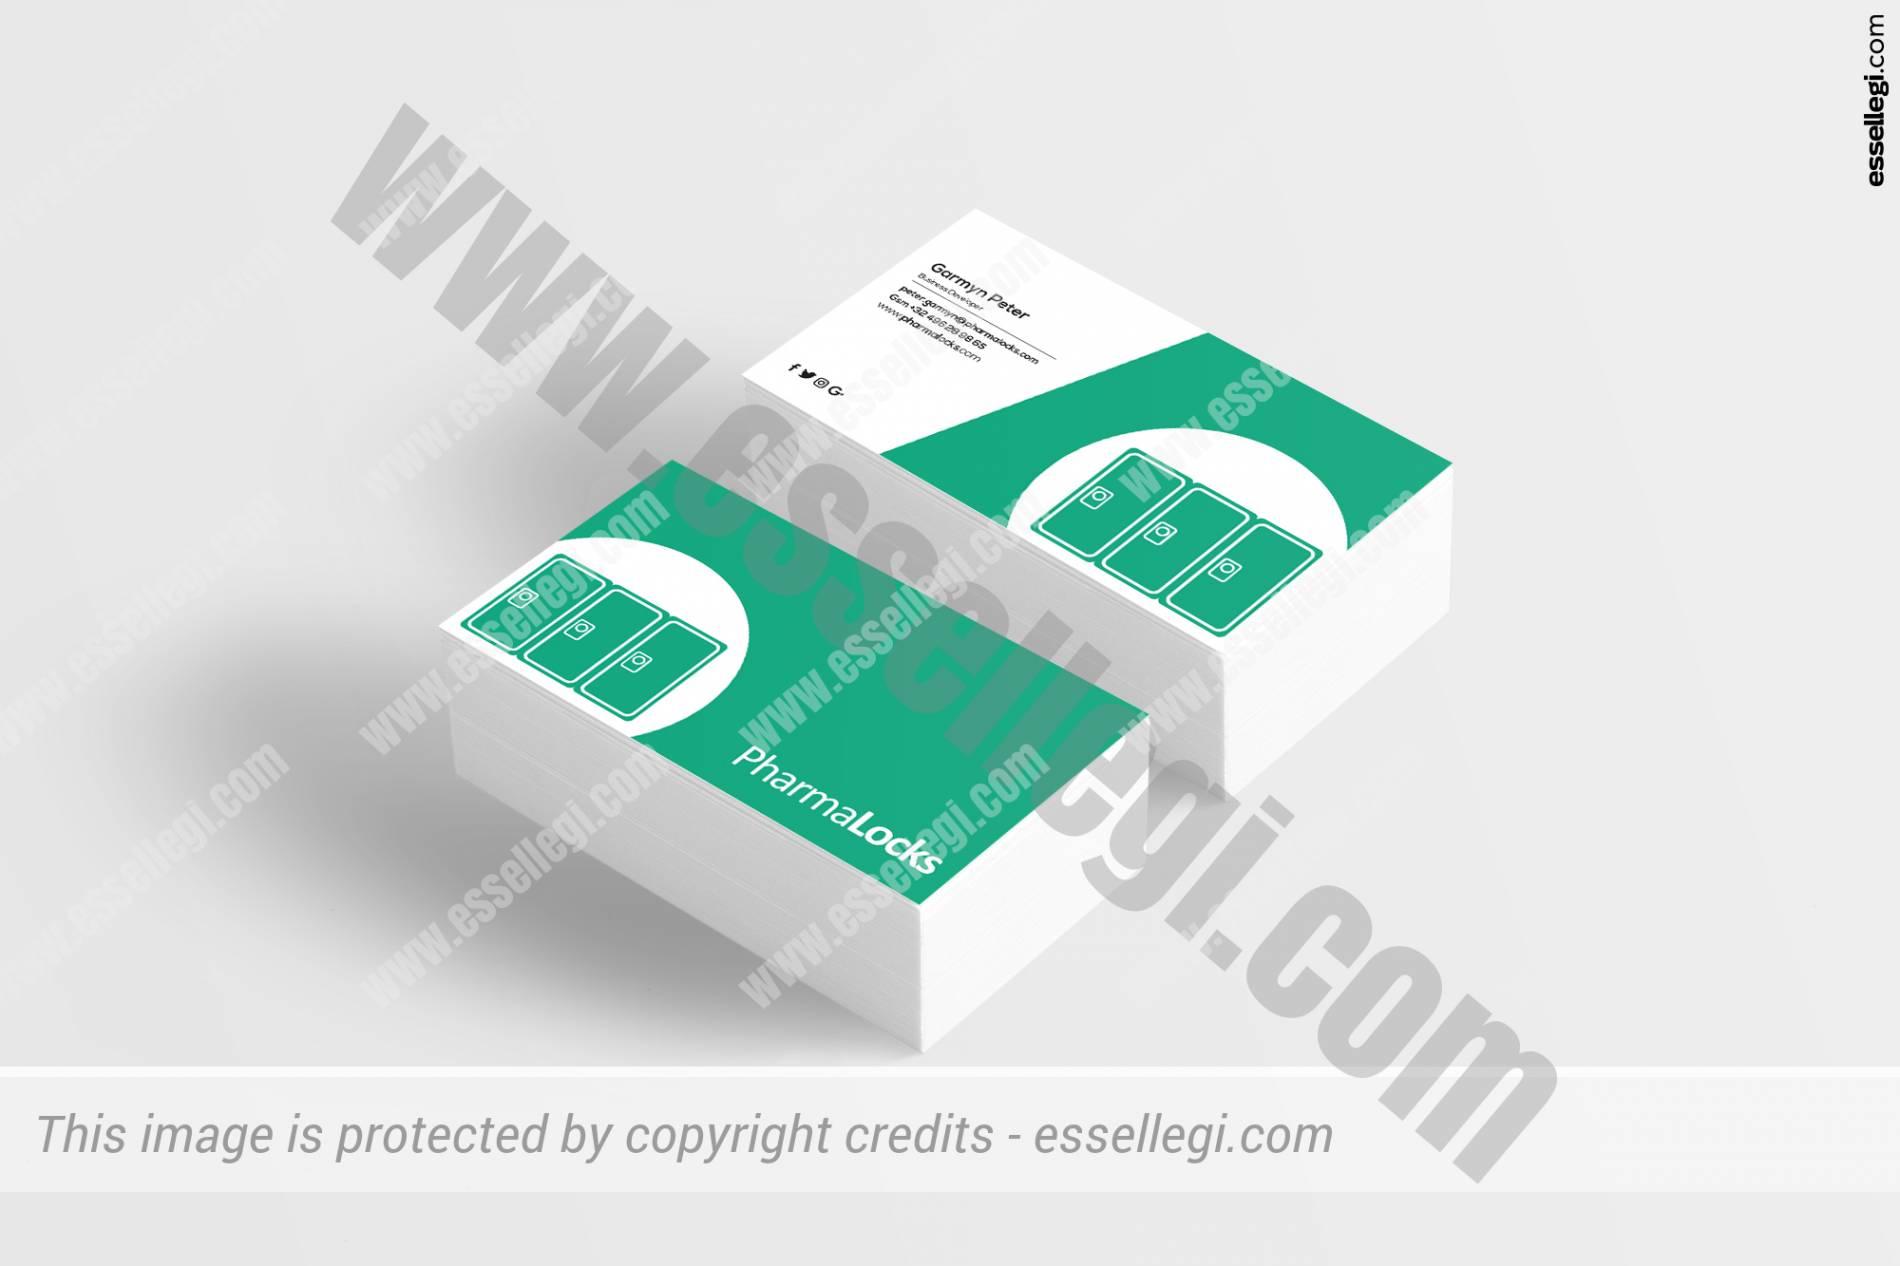 PHARMALOCKS | BUSINESS CARD DESIGN 🇧🇪